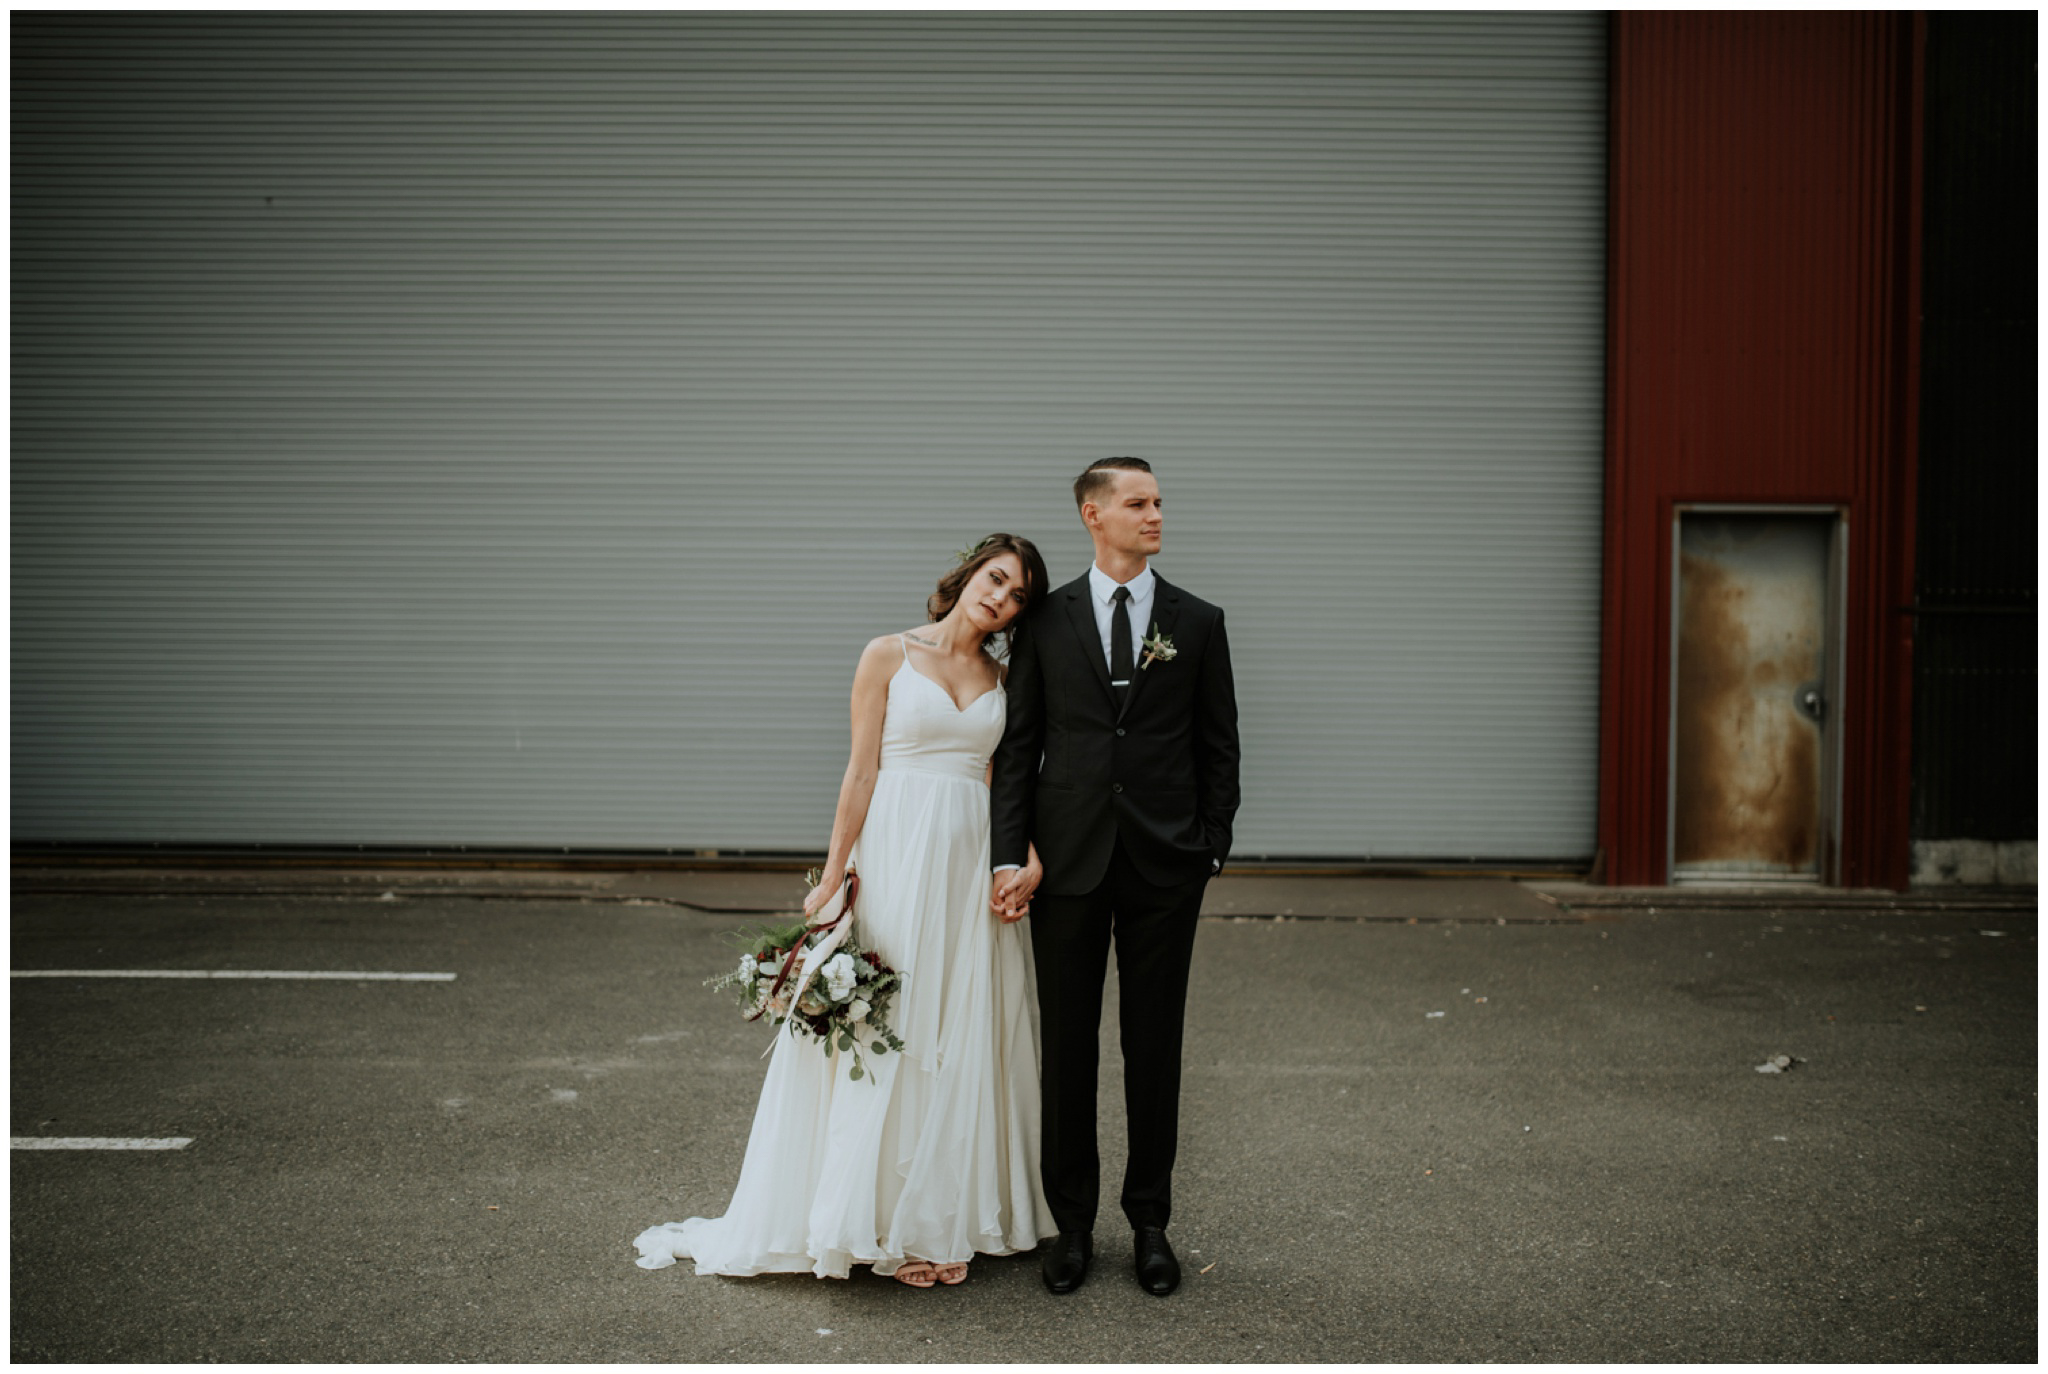 alyssa-keiran-westland-distillery-urban-seattle-wedding-photographer-caitlyn-nikula-66.jpg